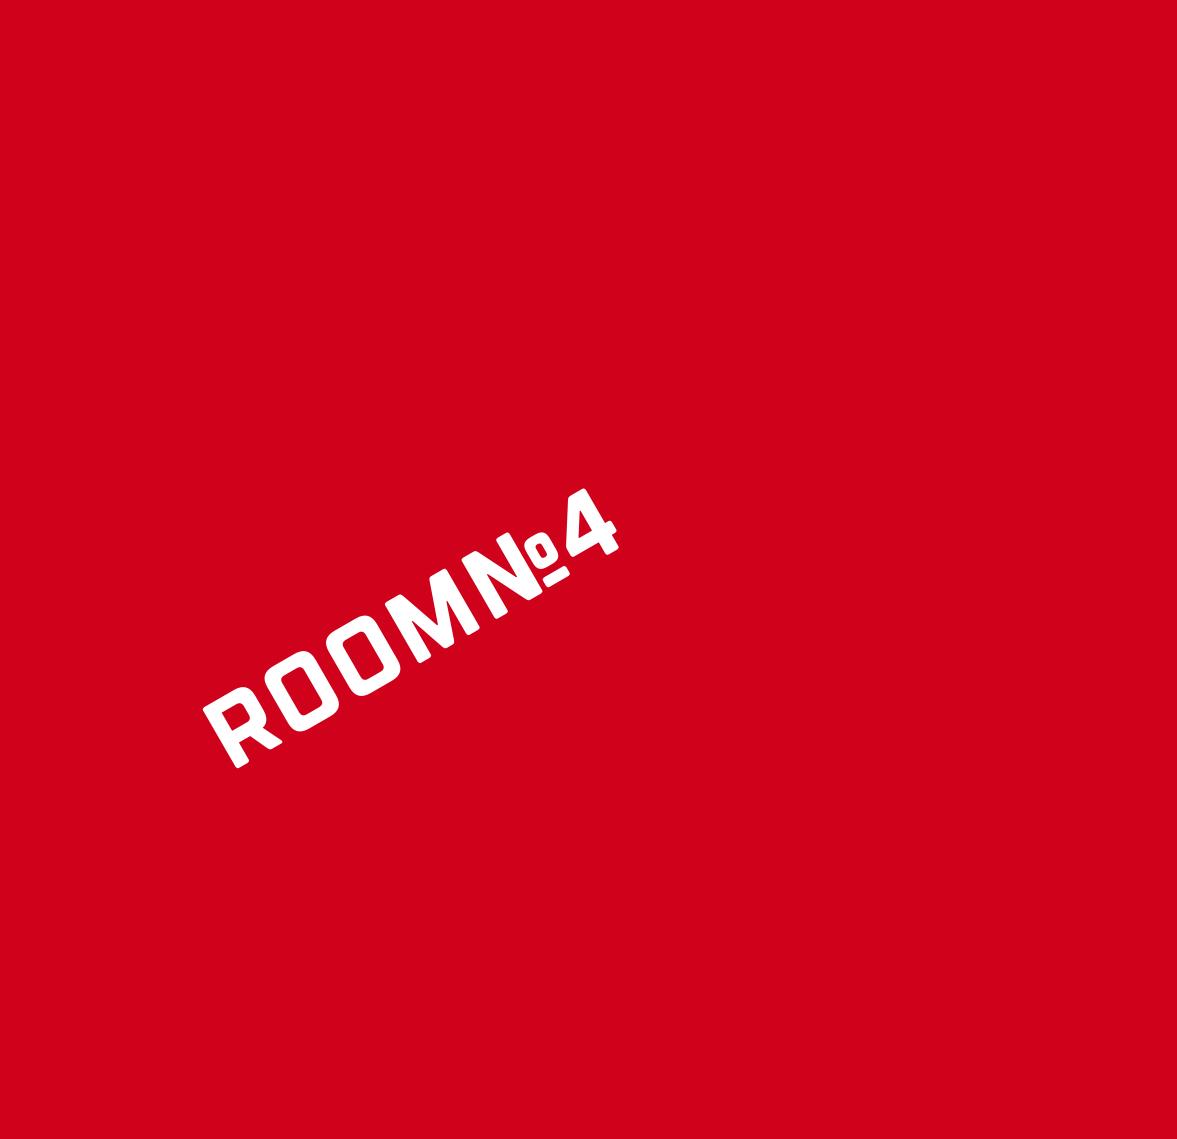 дом советов комната4 copy